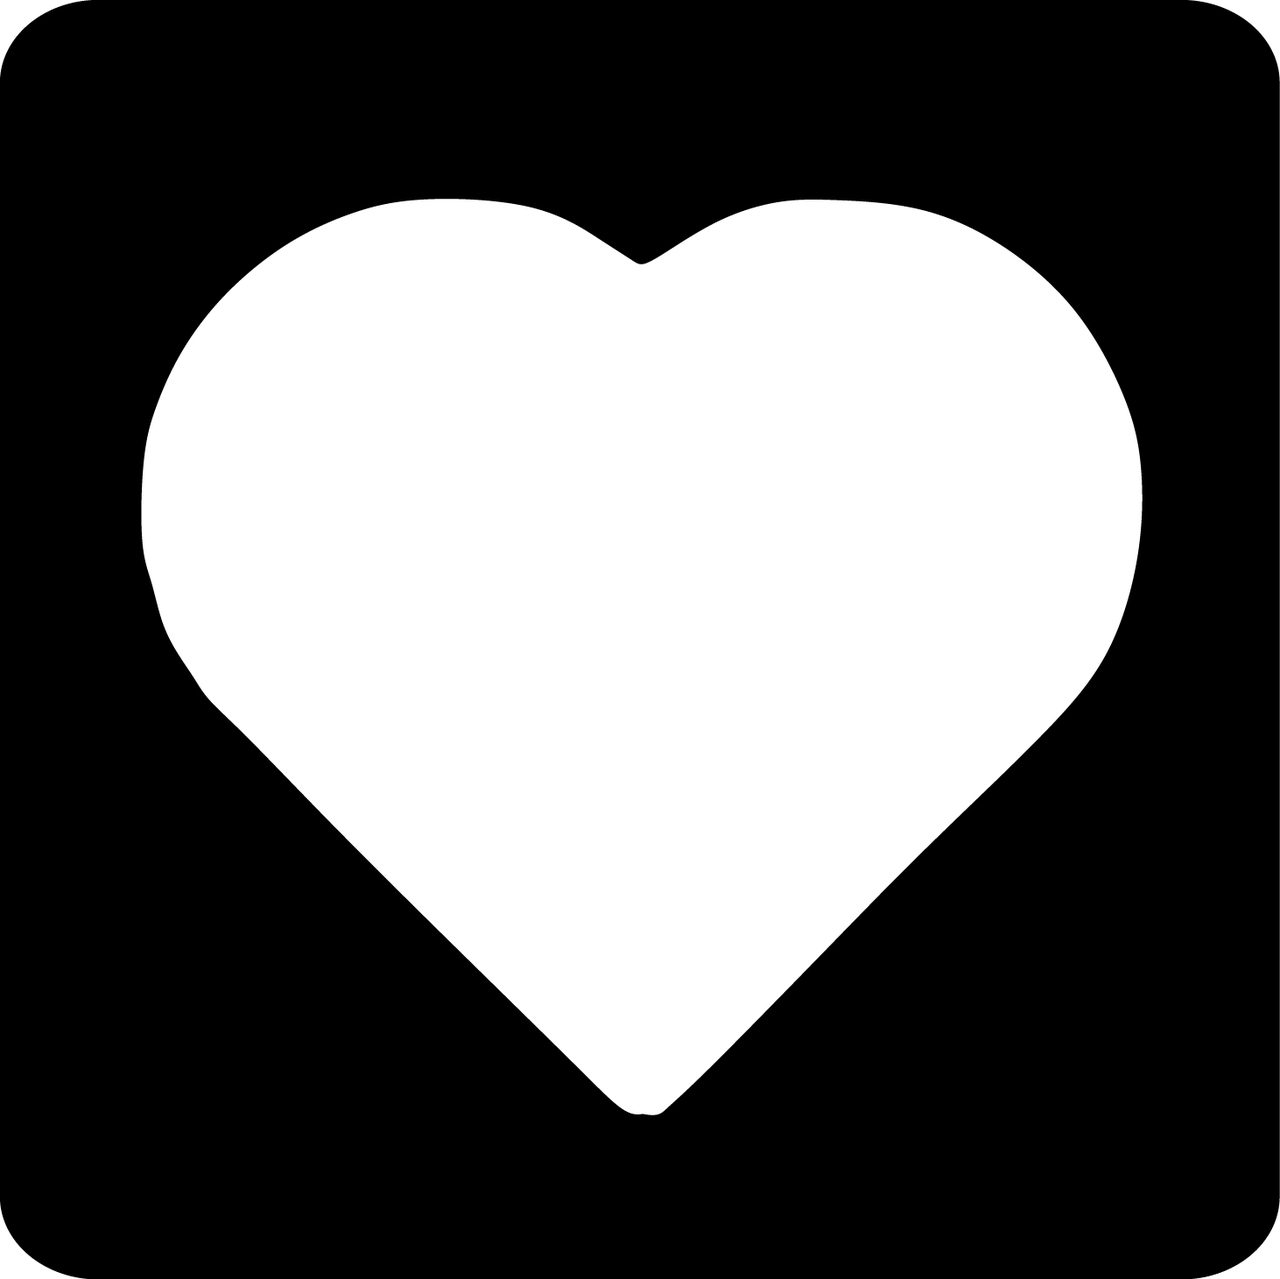 Valentines - HEART 2